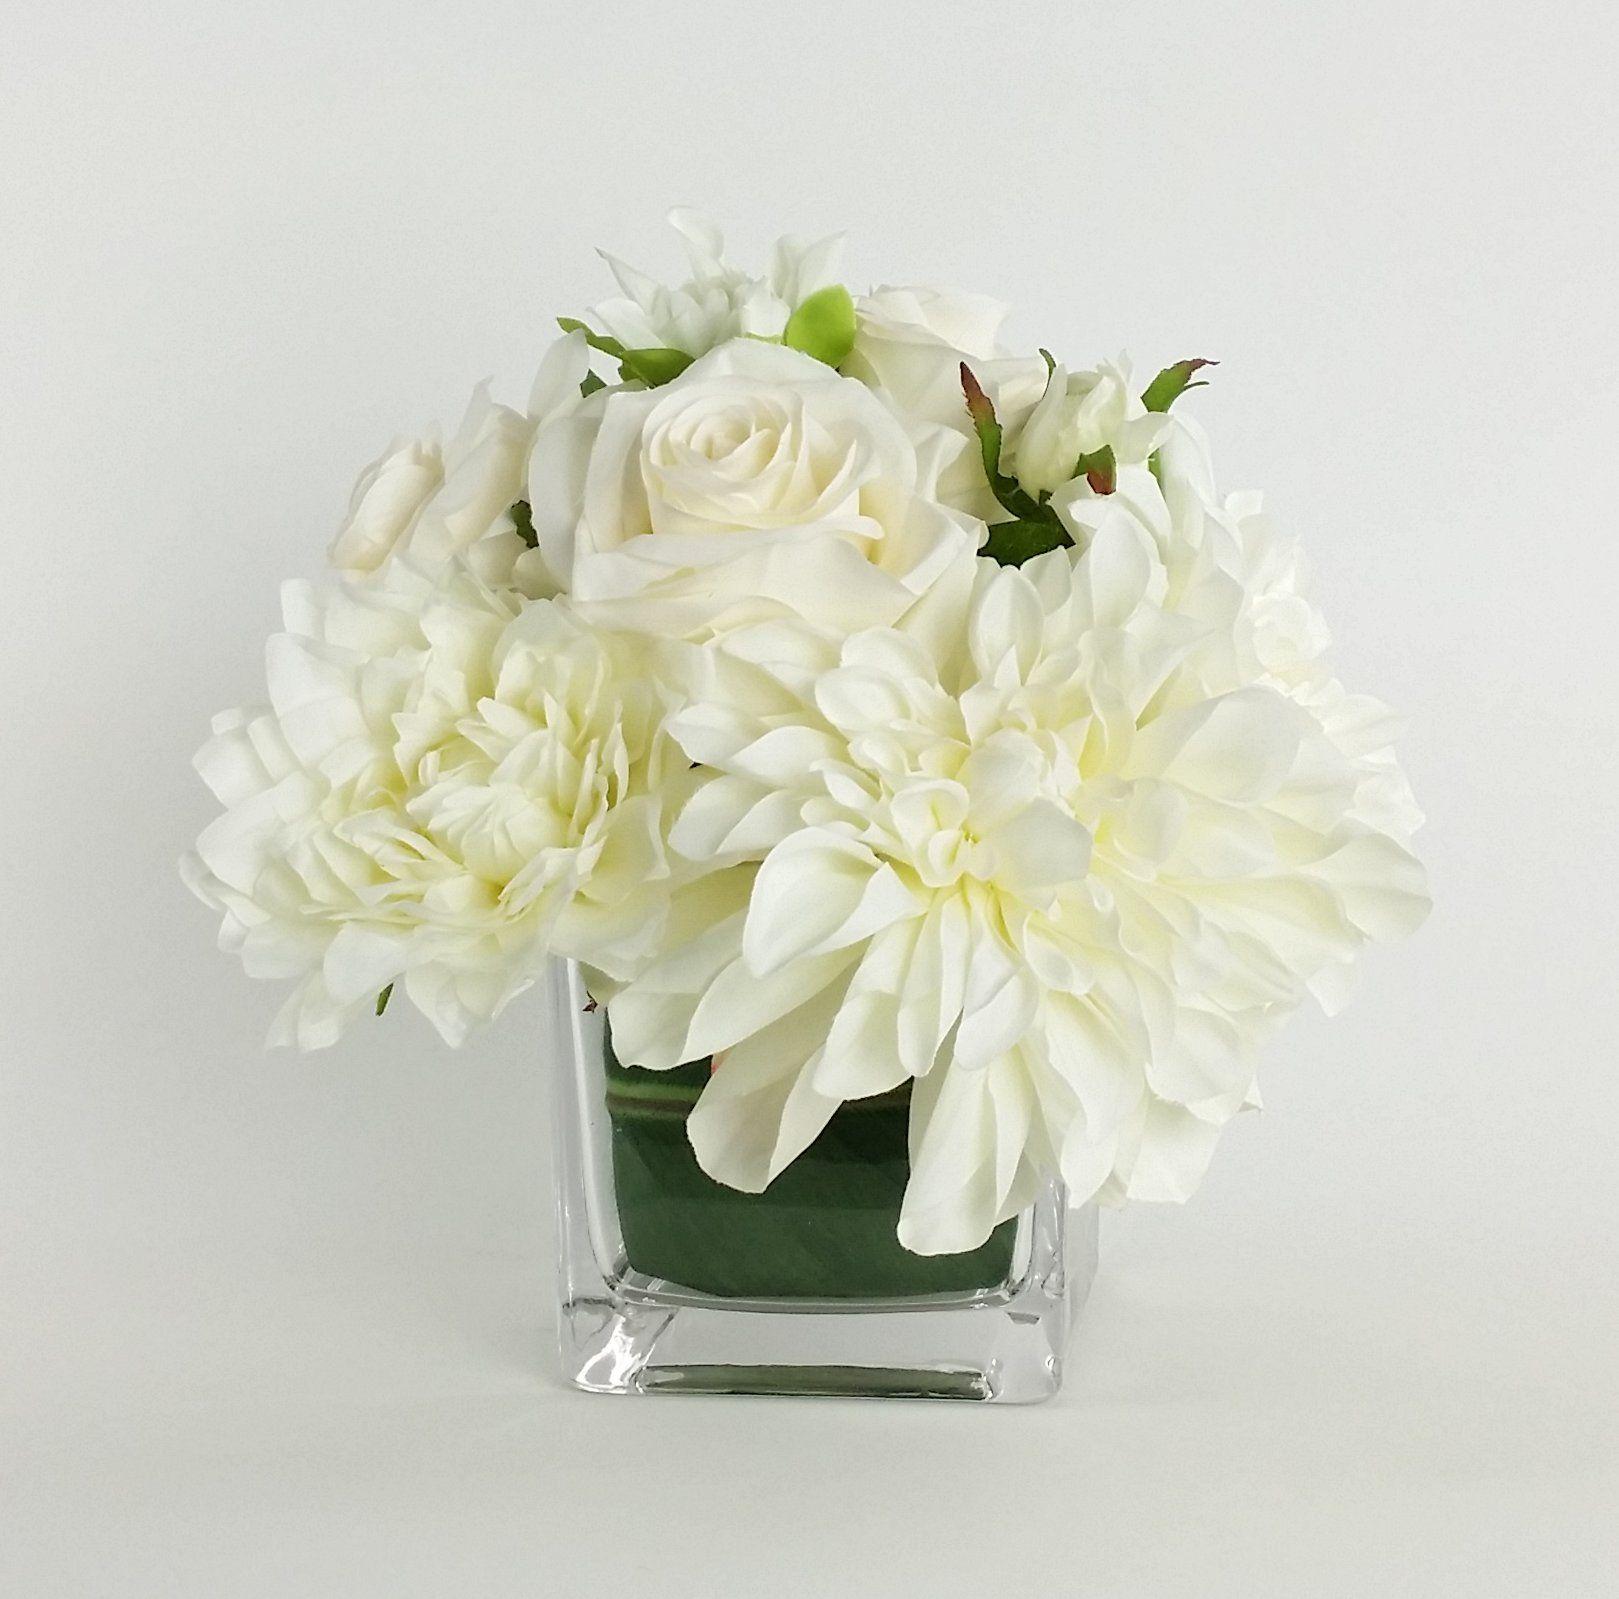 Artificial Silk Mixed Floral Arrangements In Decorative Vase Vases Decor Floral Arrangements Floral